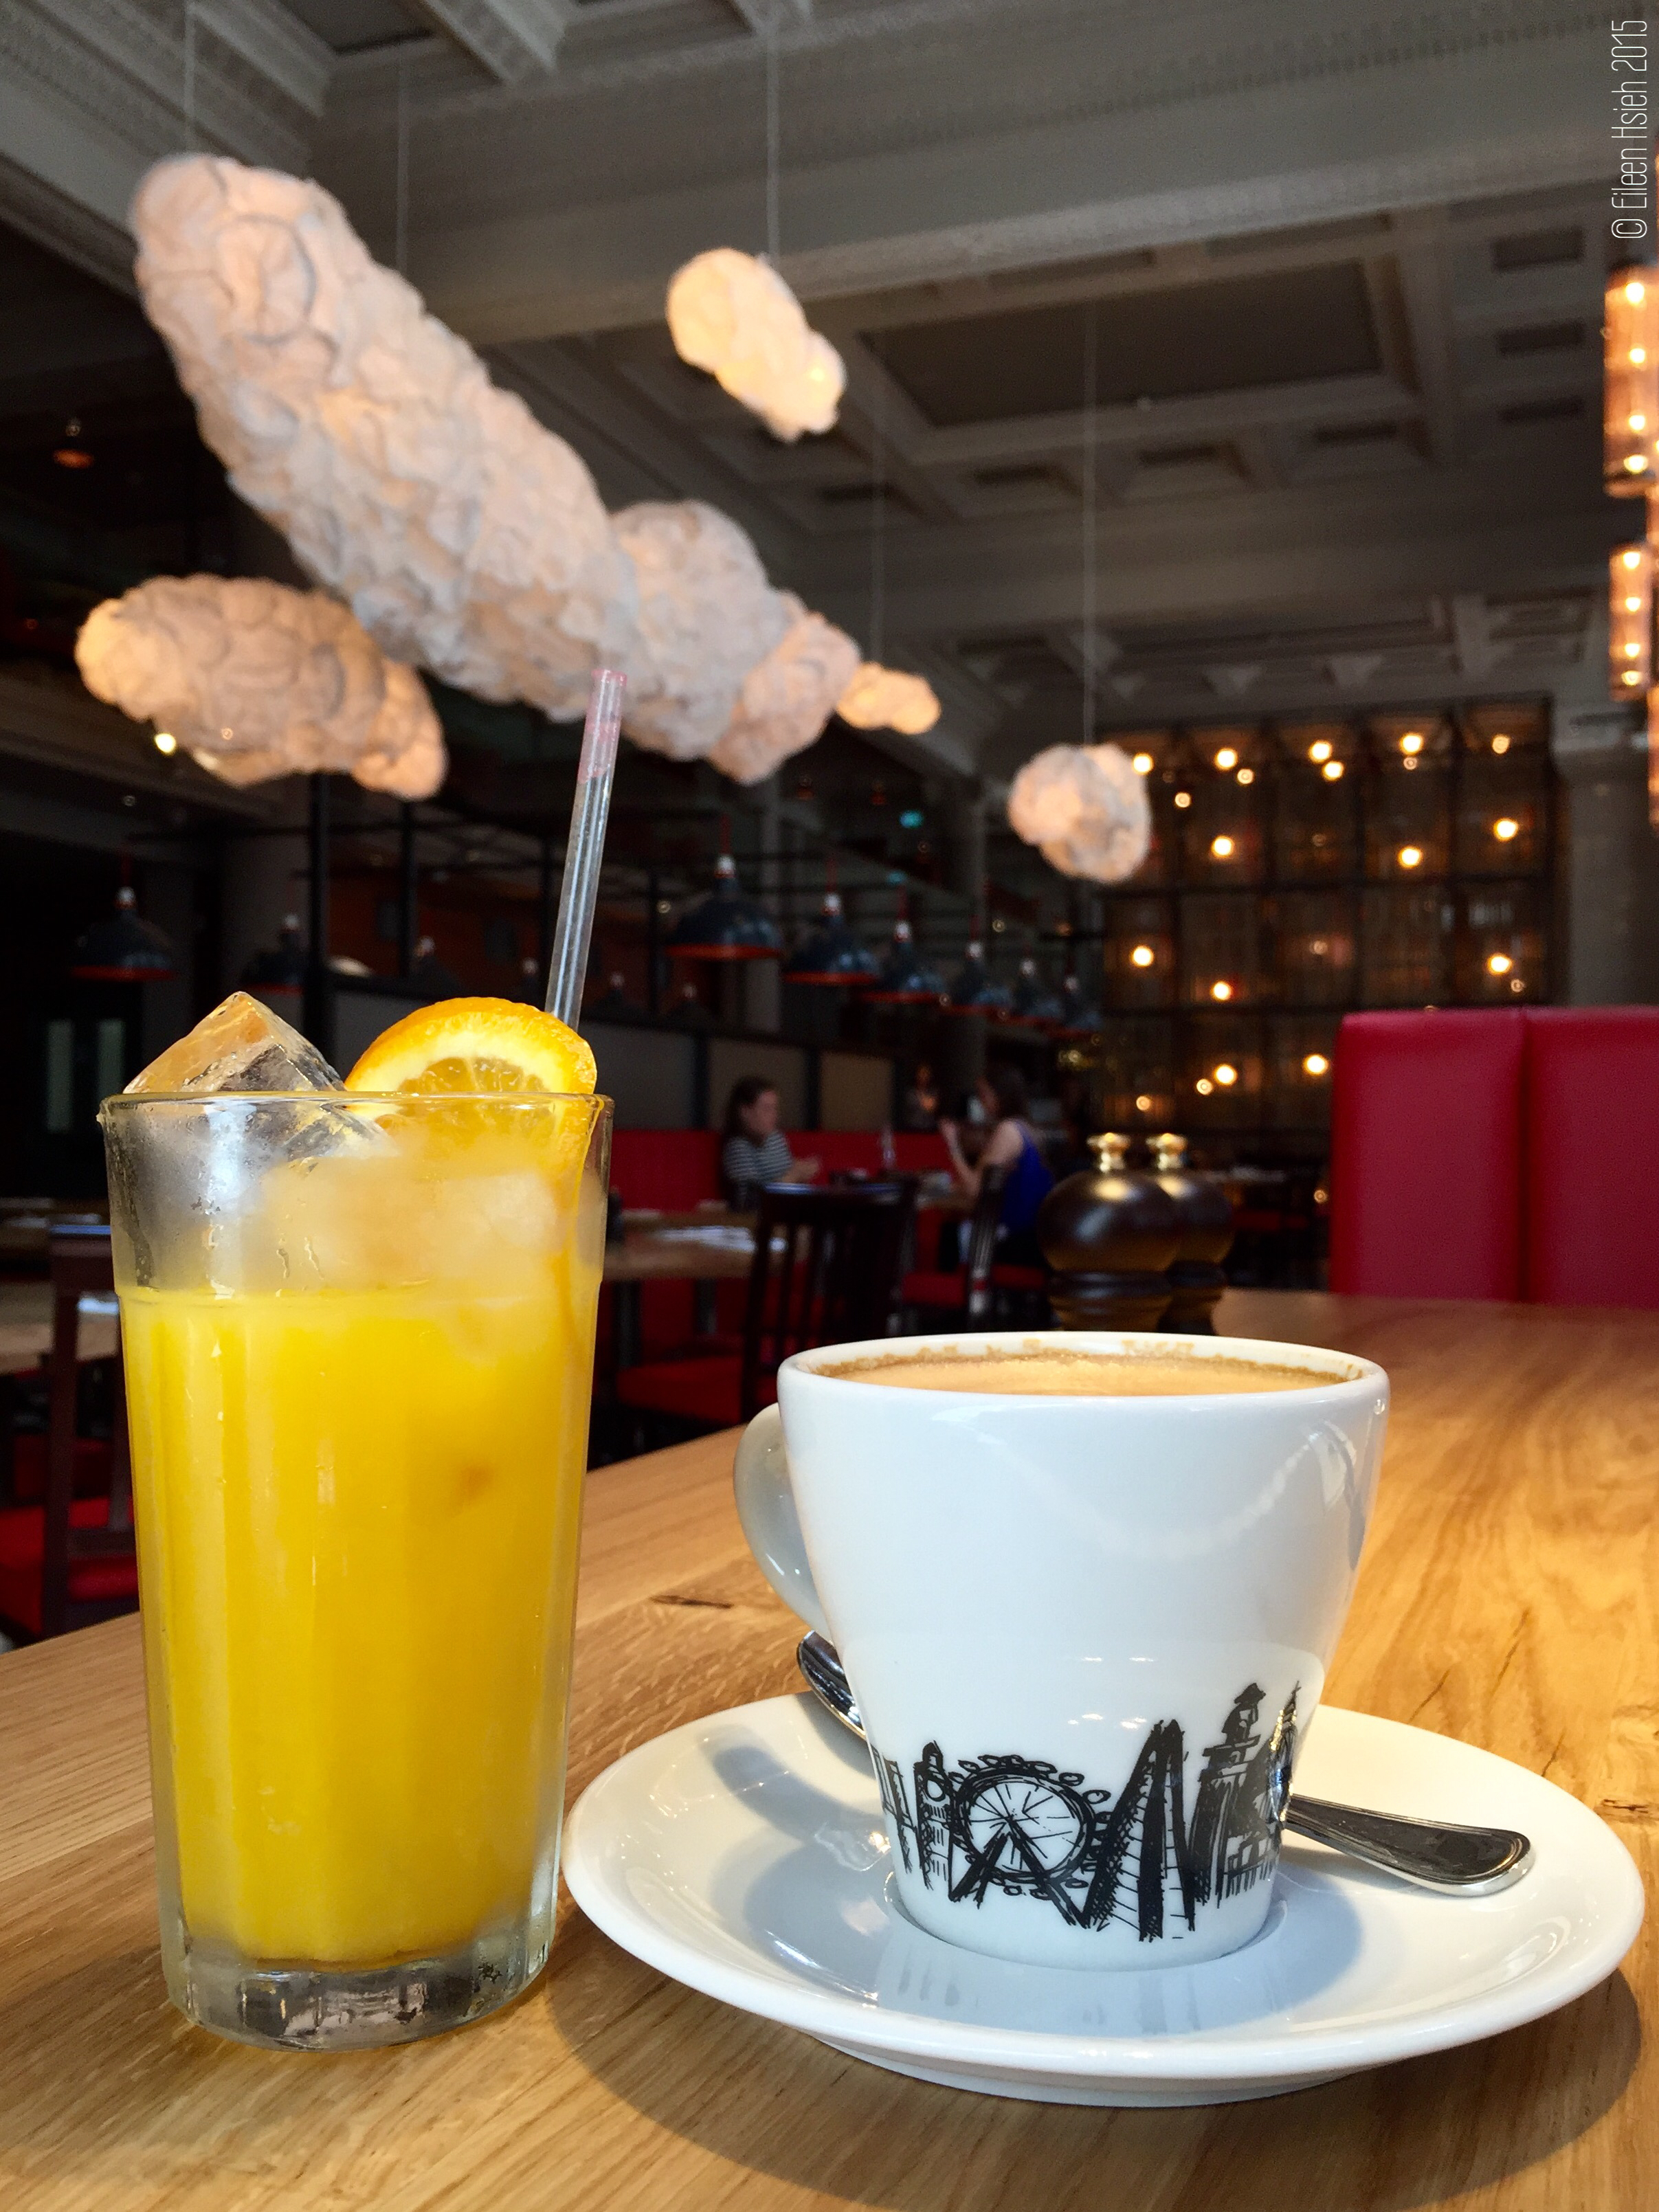 Coffee or tea and juice complete Burger & Lobster's breakfast set-menu. 「漢堡 & 龍蝦」的早餐 套餐配有熱飲(茶或咖啡)和果汁。  © Eileen Hsieh 2015